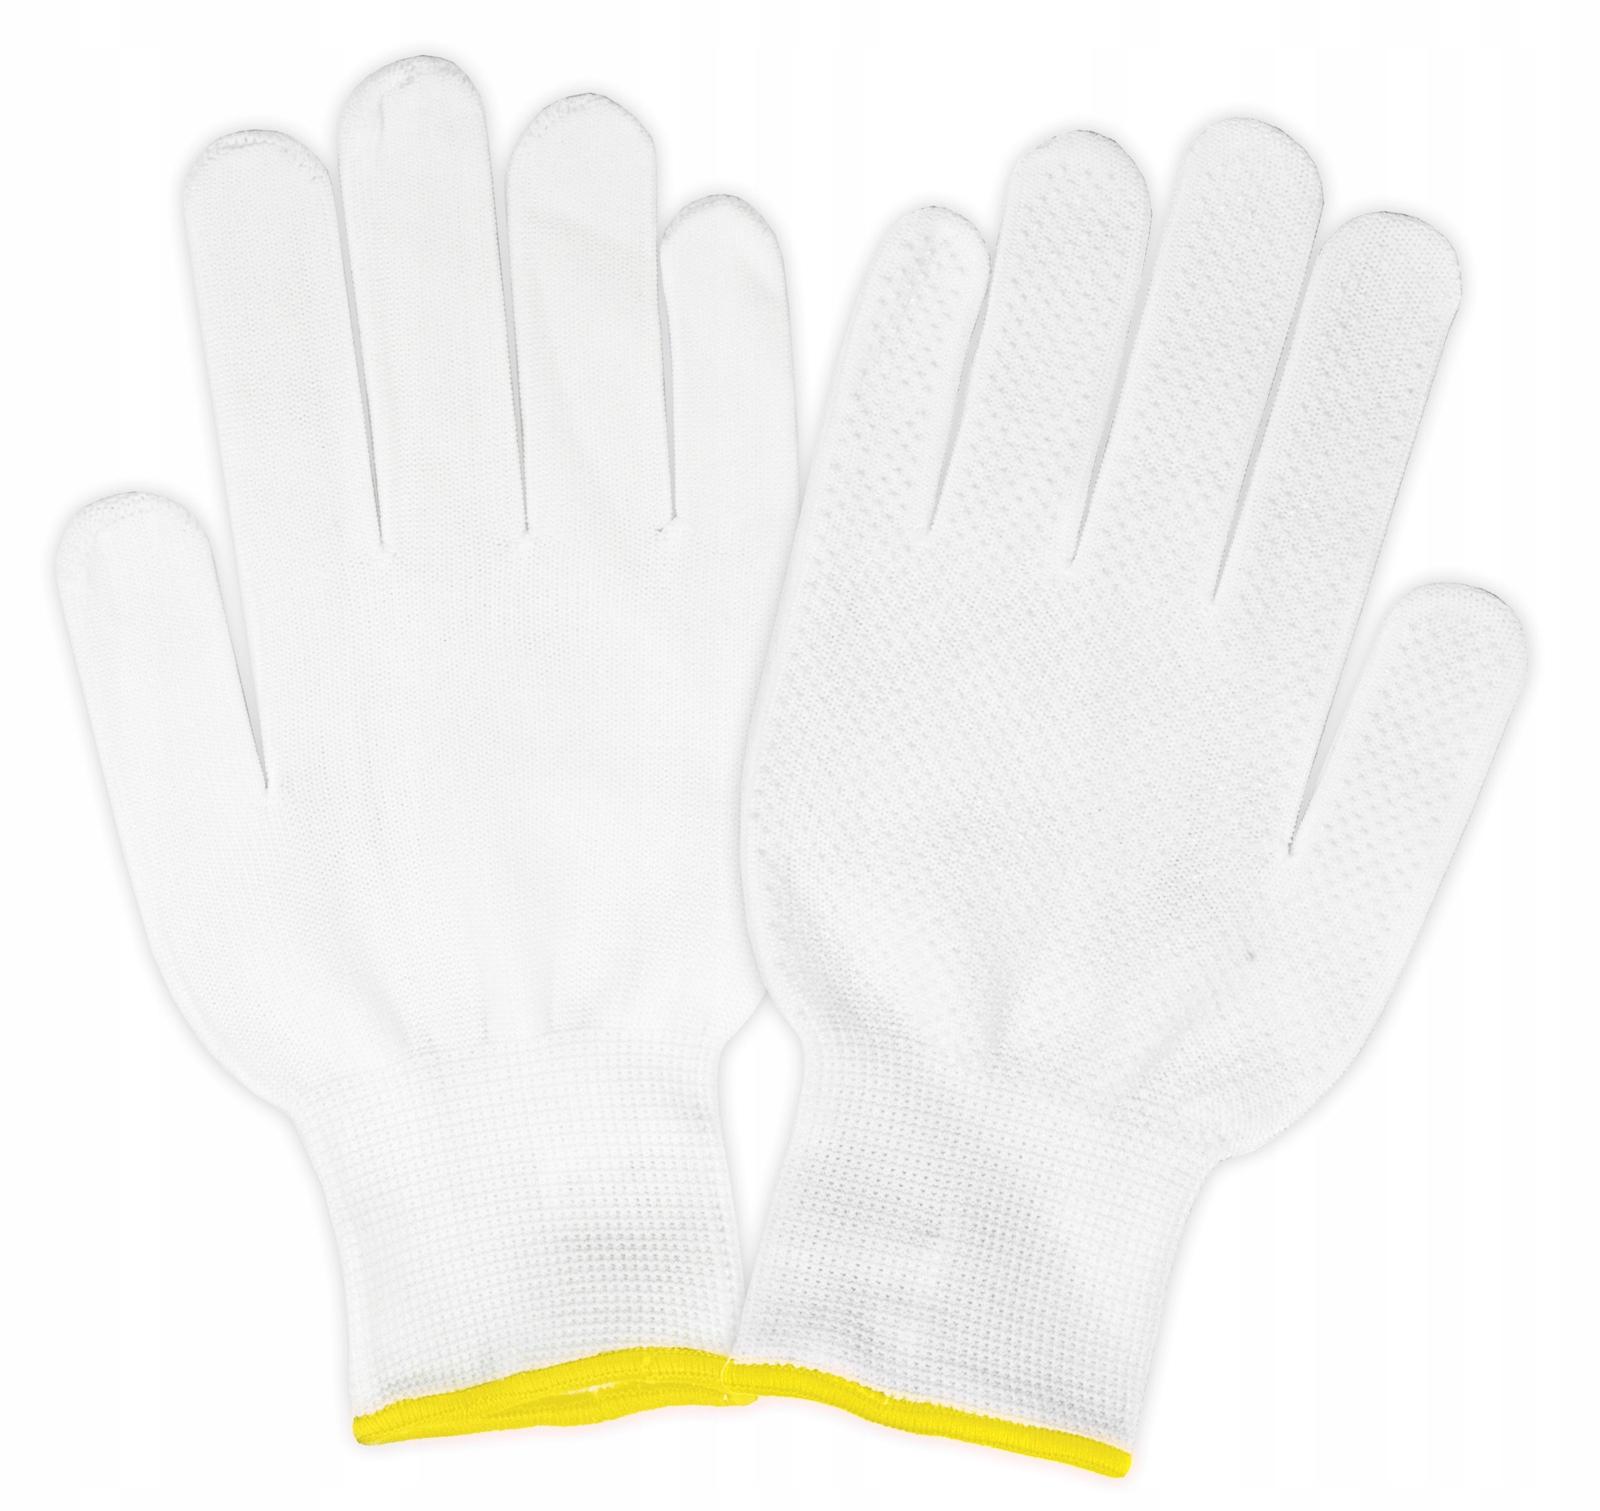 d9ddbc7d4b949d Rękawice bawełniane nakrapiane robocze -7/8 białe - 7516489520 ...